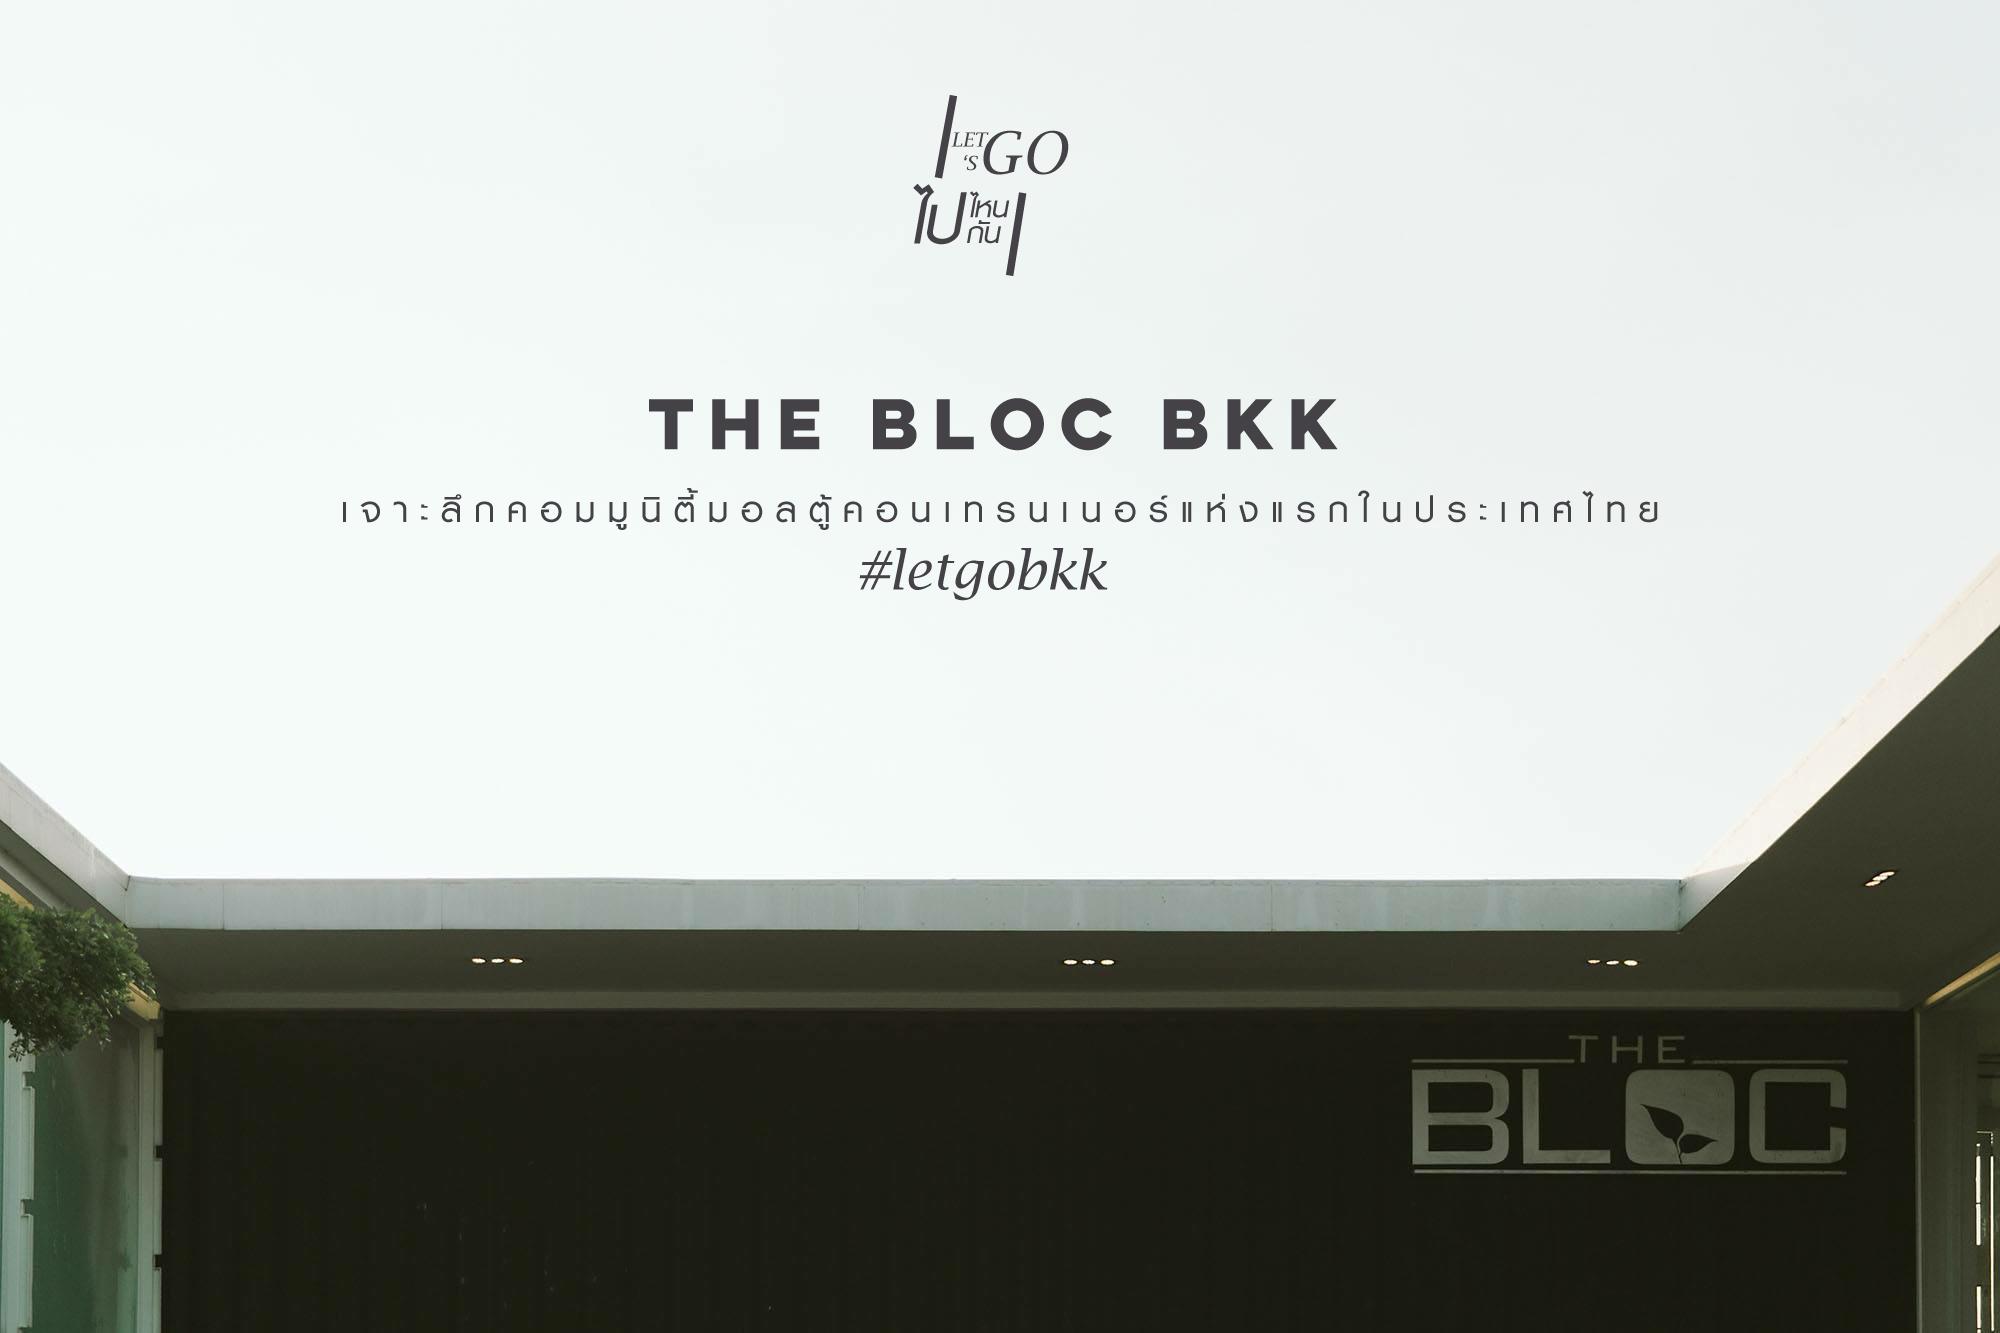 THE-BLOC1.jpg